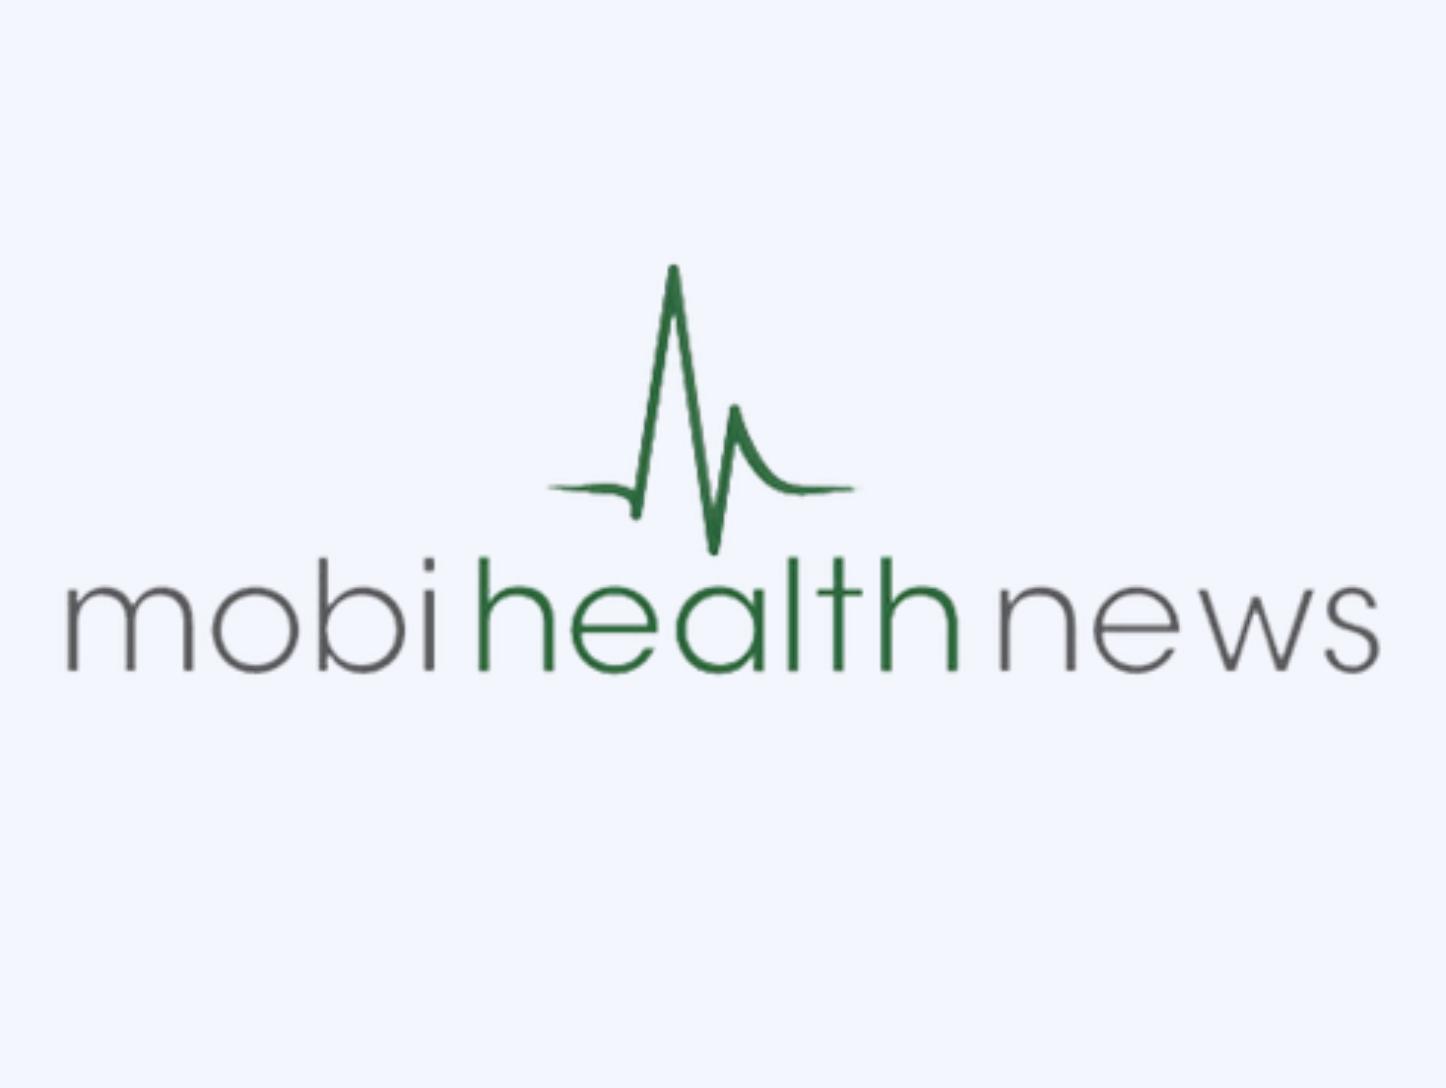 mobihealthnews: Hospital Digitization